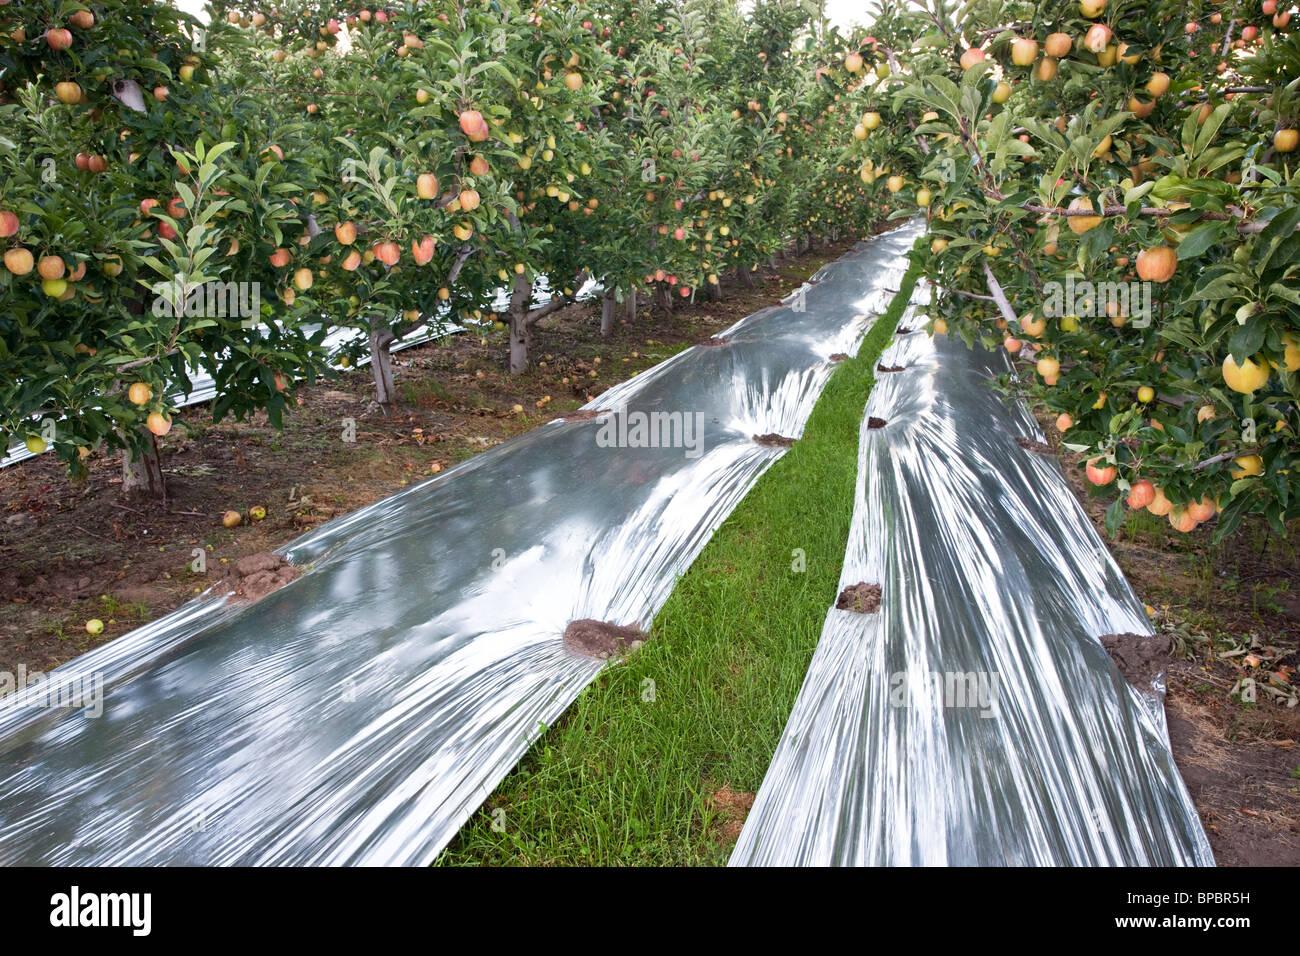 Apples  'Gala' orchard. - Stock Image